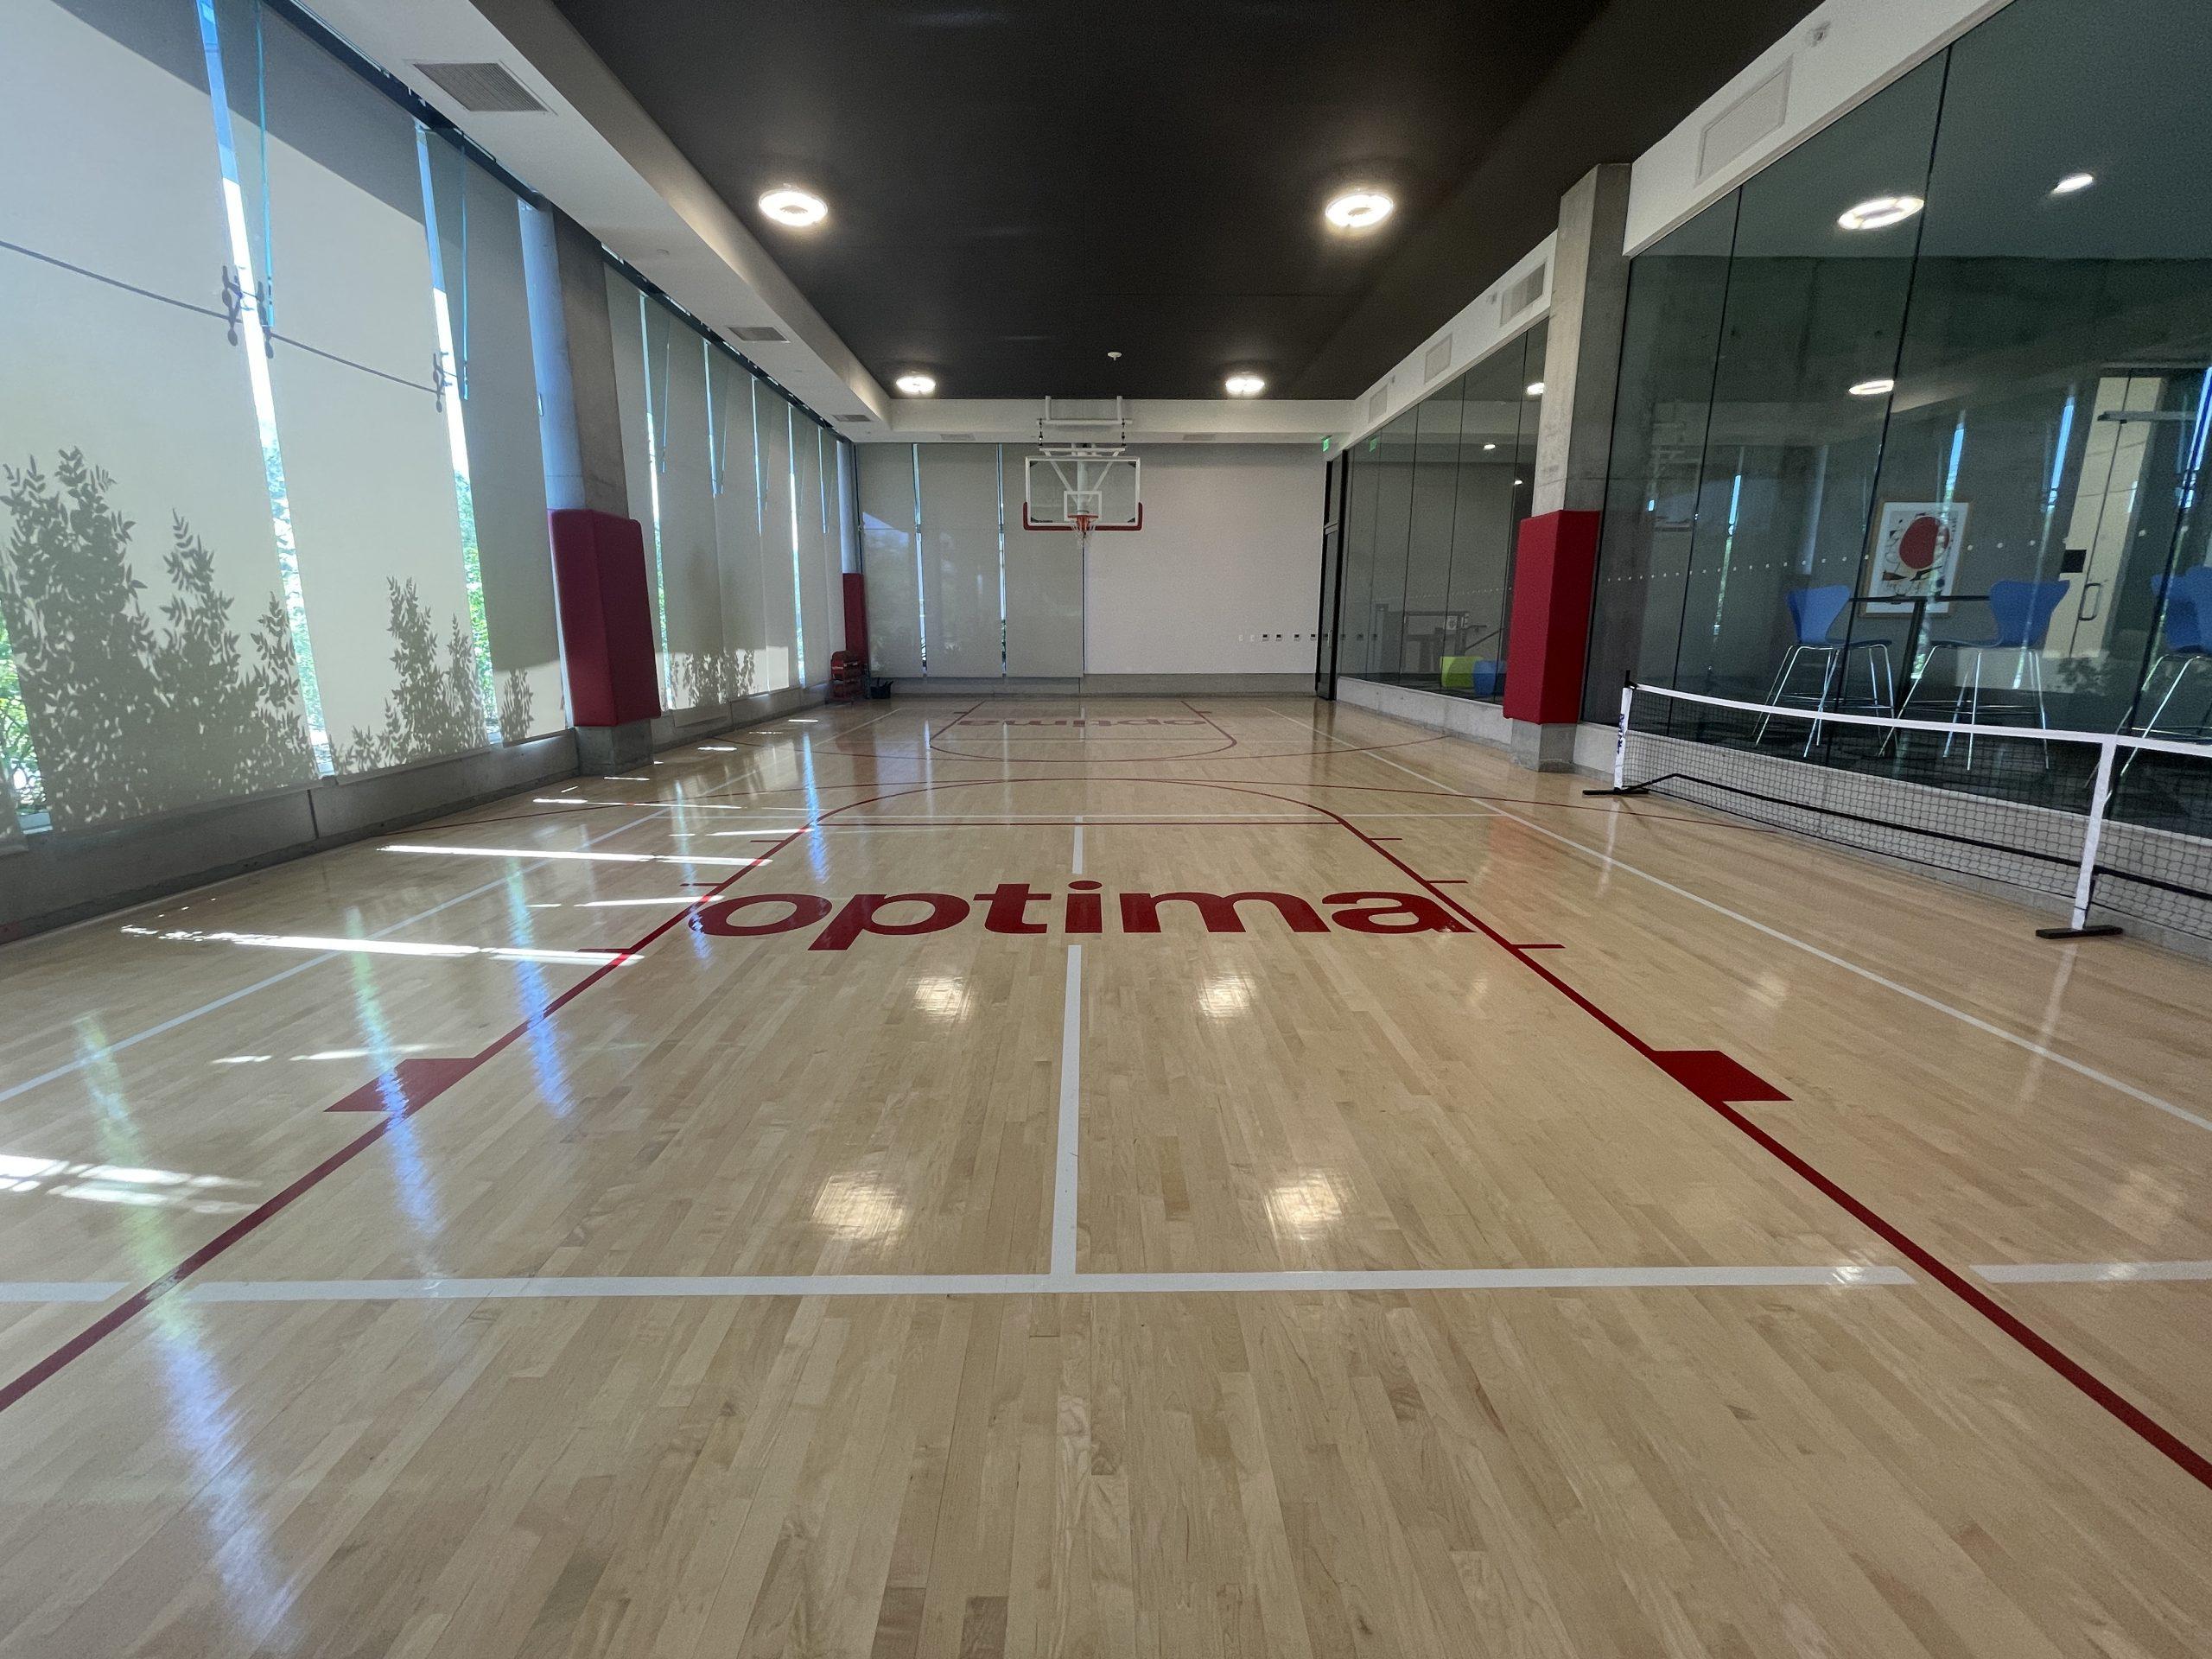 Basketball and Pickleball courts at Optima Kierland